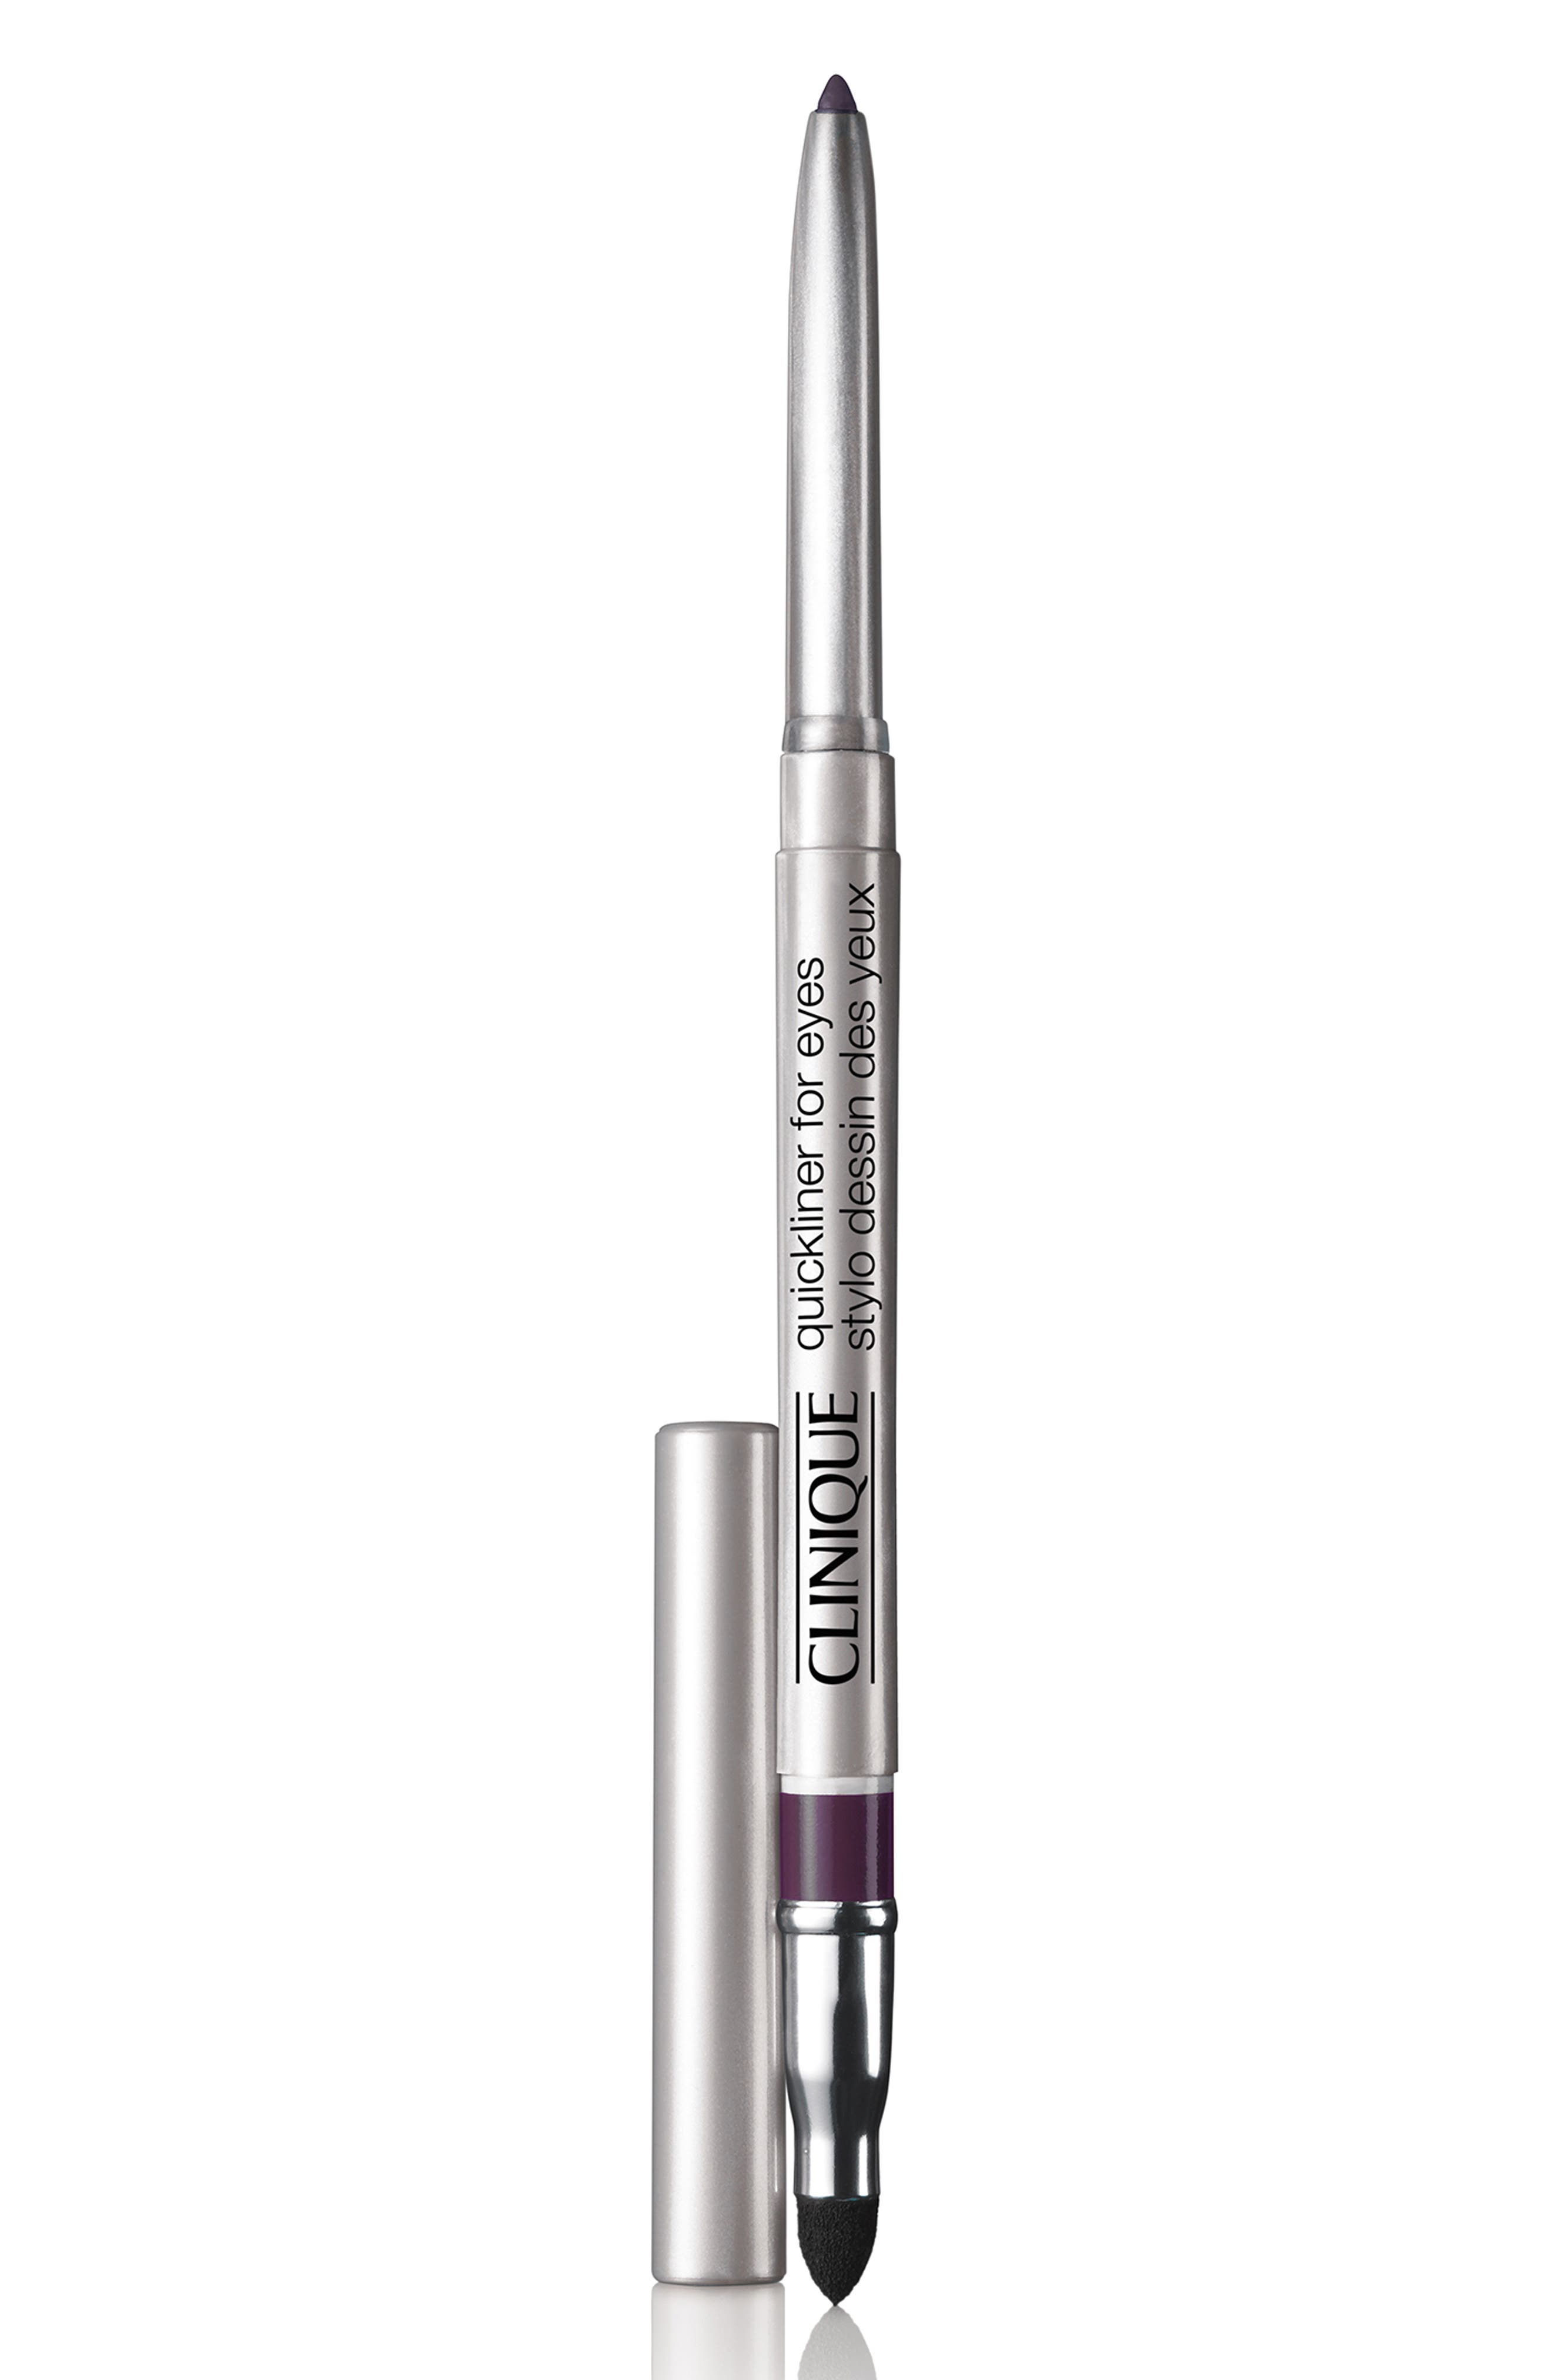 Clinique Quickliner For Eyes Eyeliner Pencil - Grape